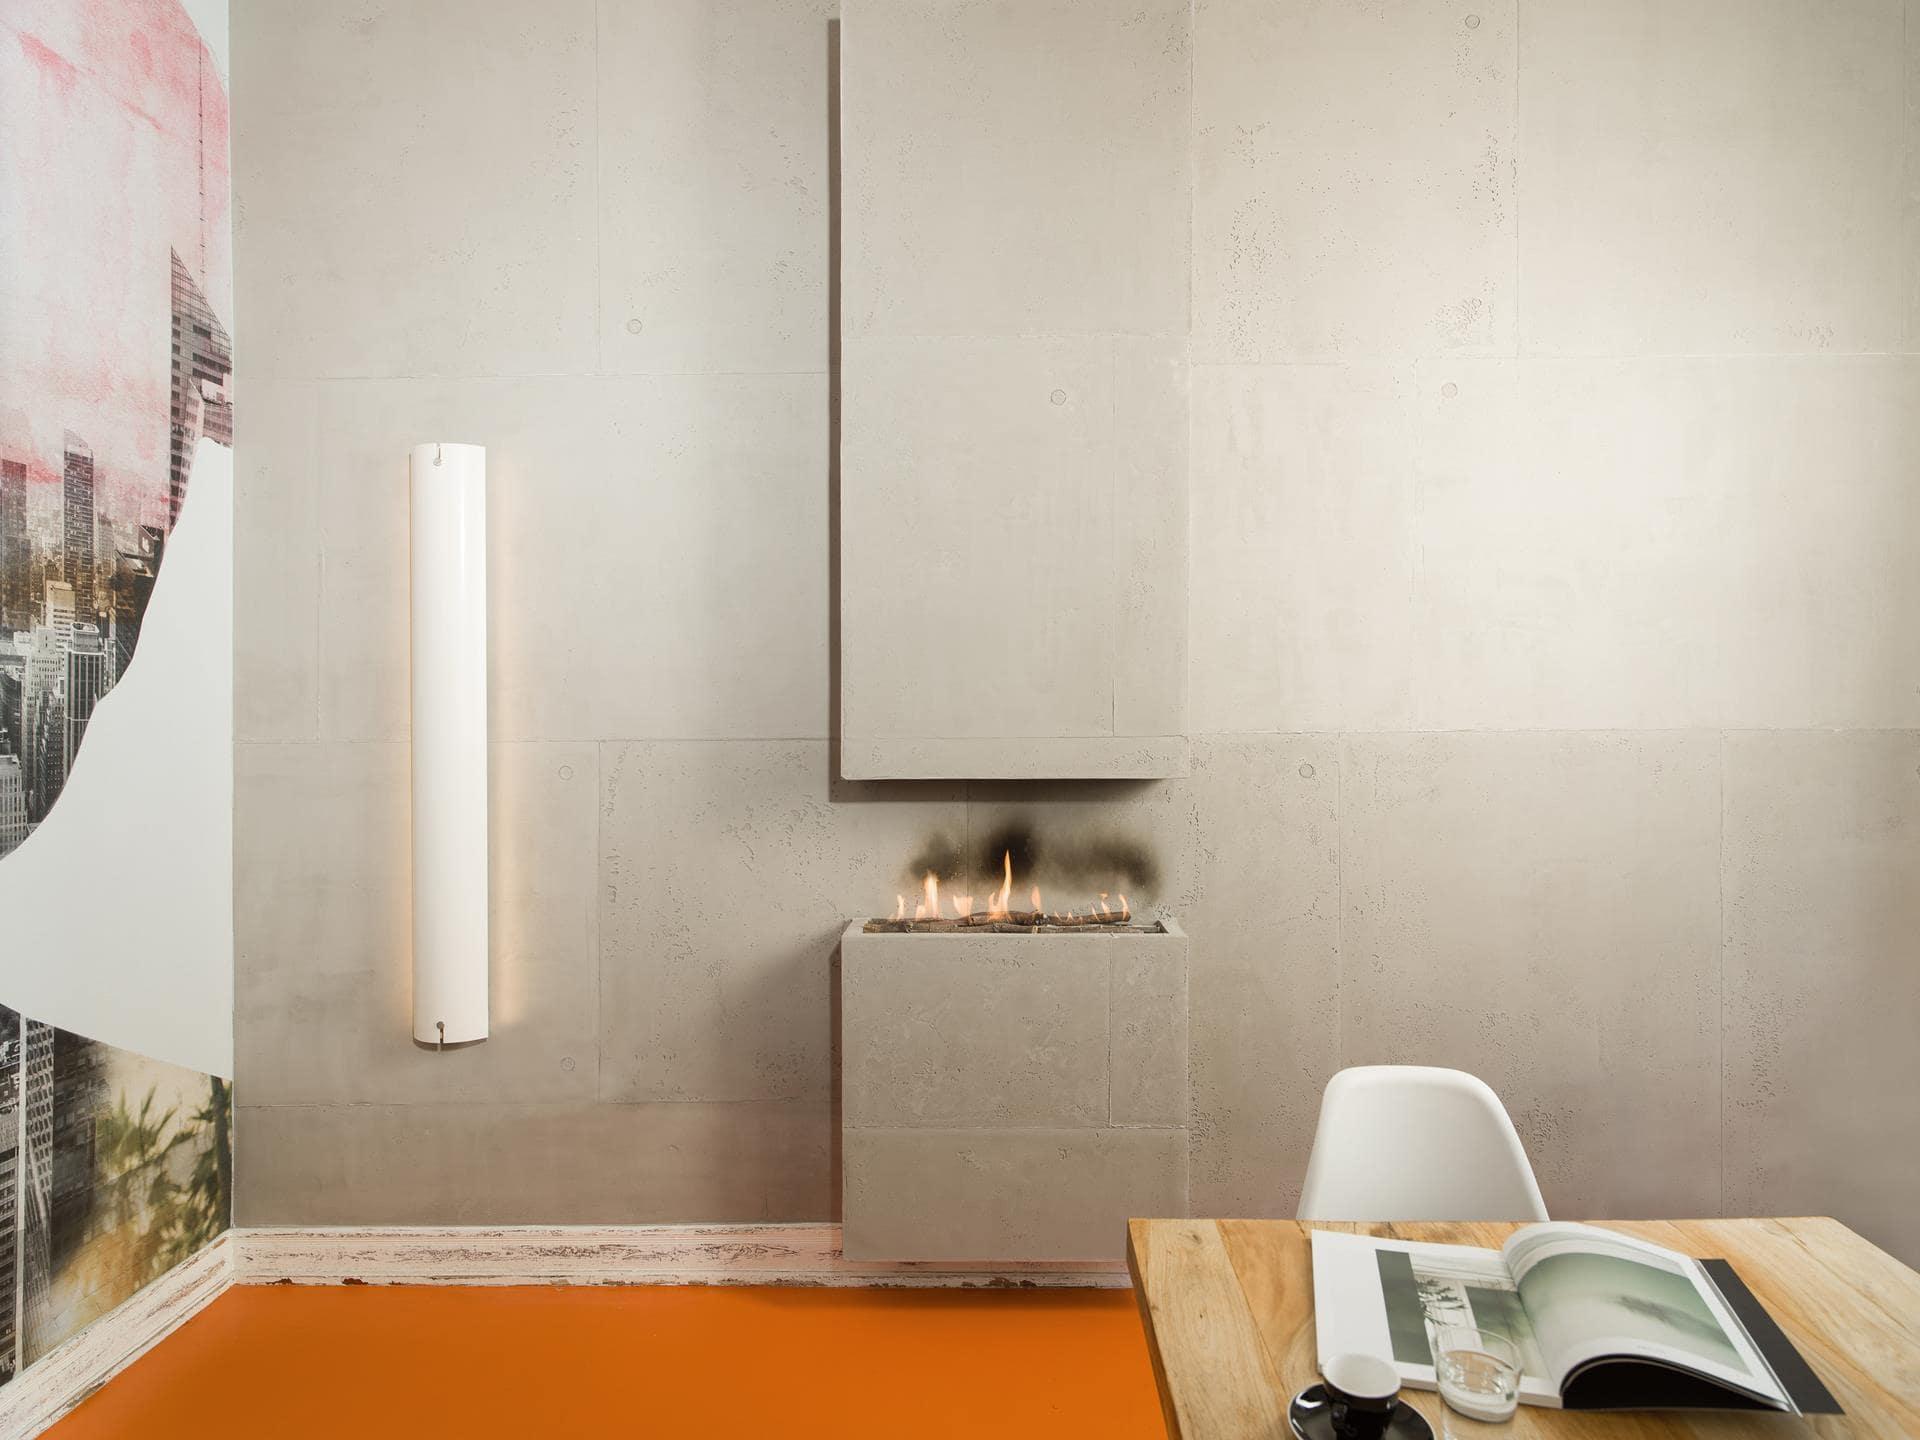 Ausstellung-Showroom-bad-glamora-spachtelboden-betonoptik-fugenlos-gestaltungsmaler-spohn-wiesbaden-02